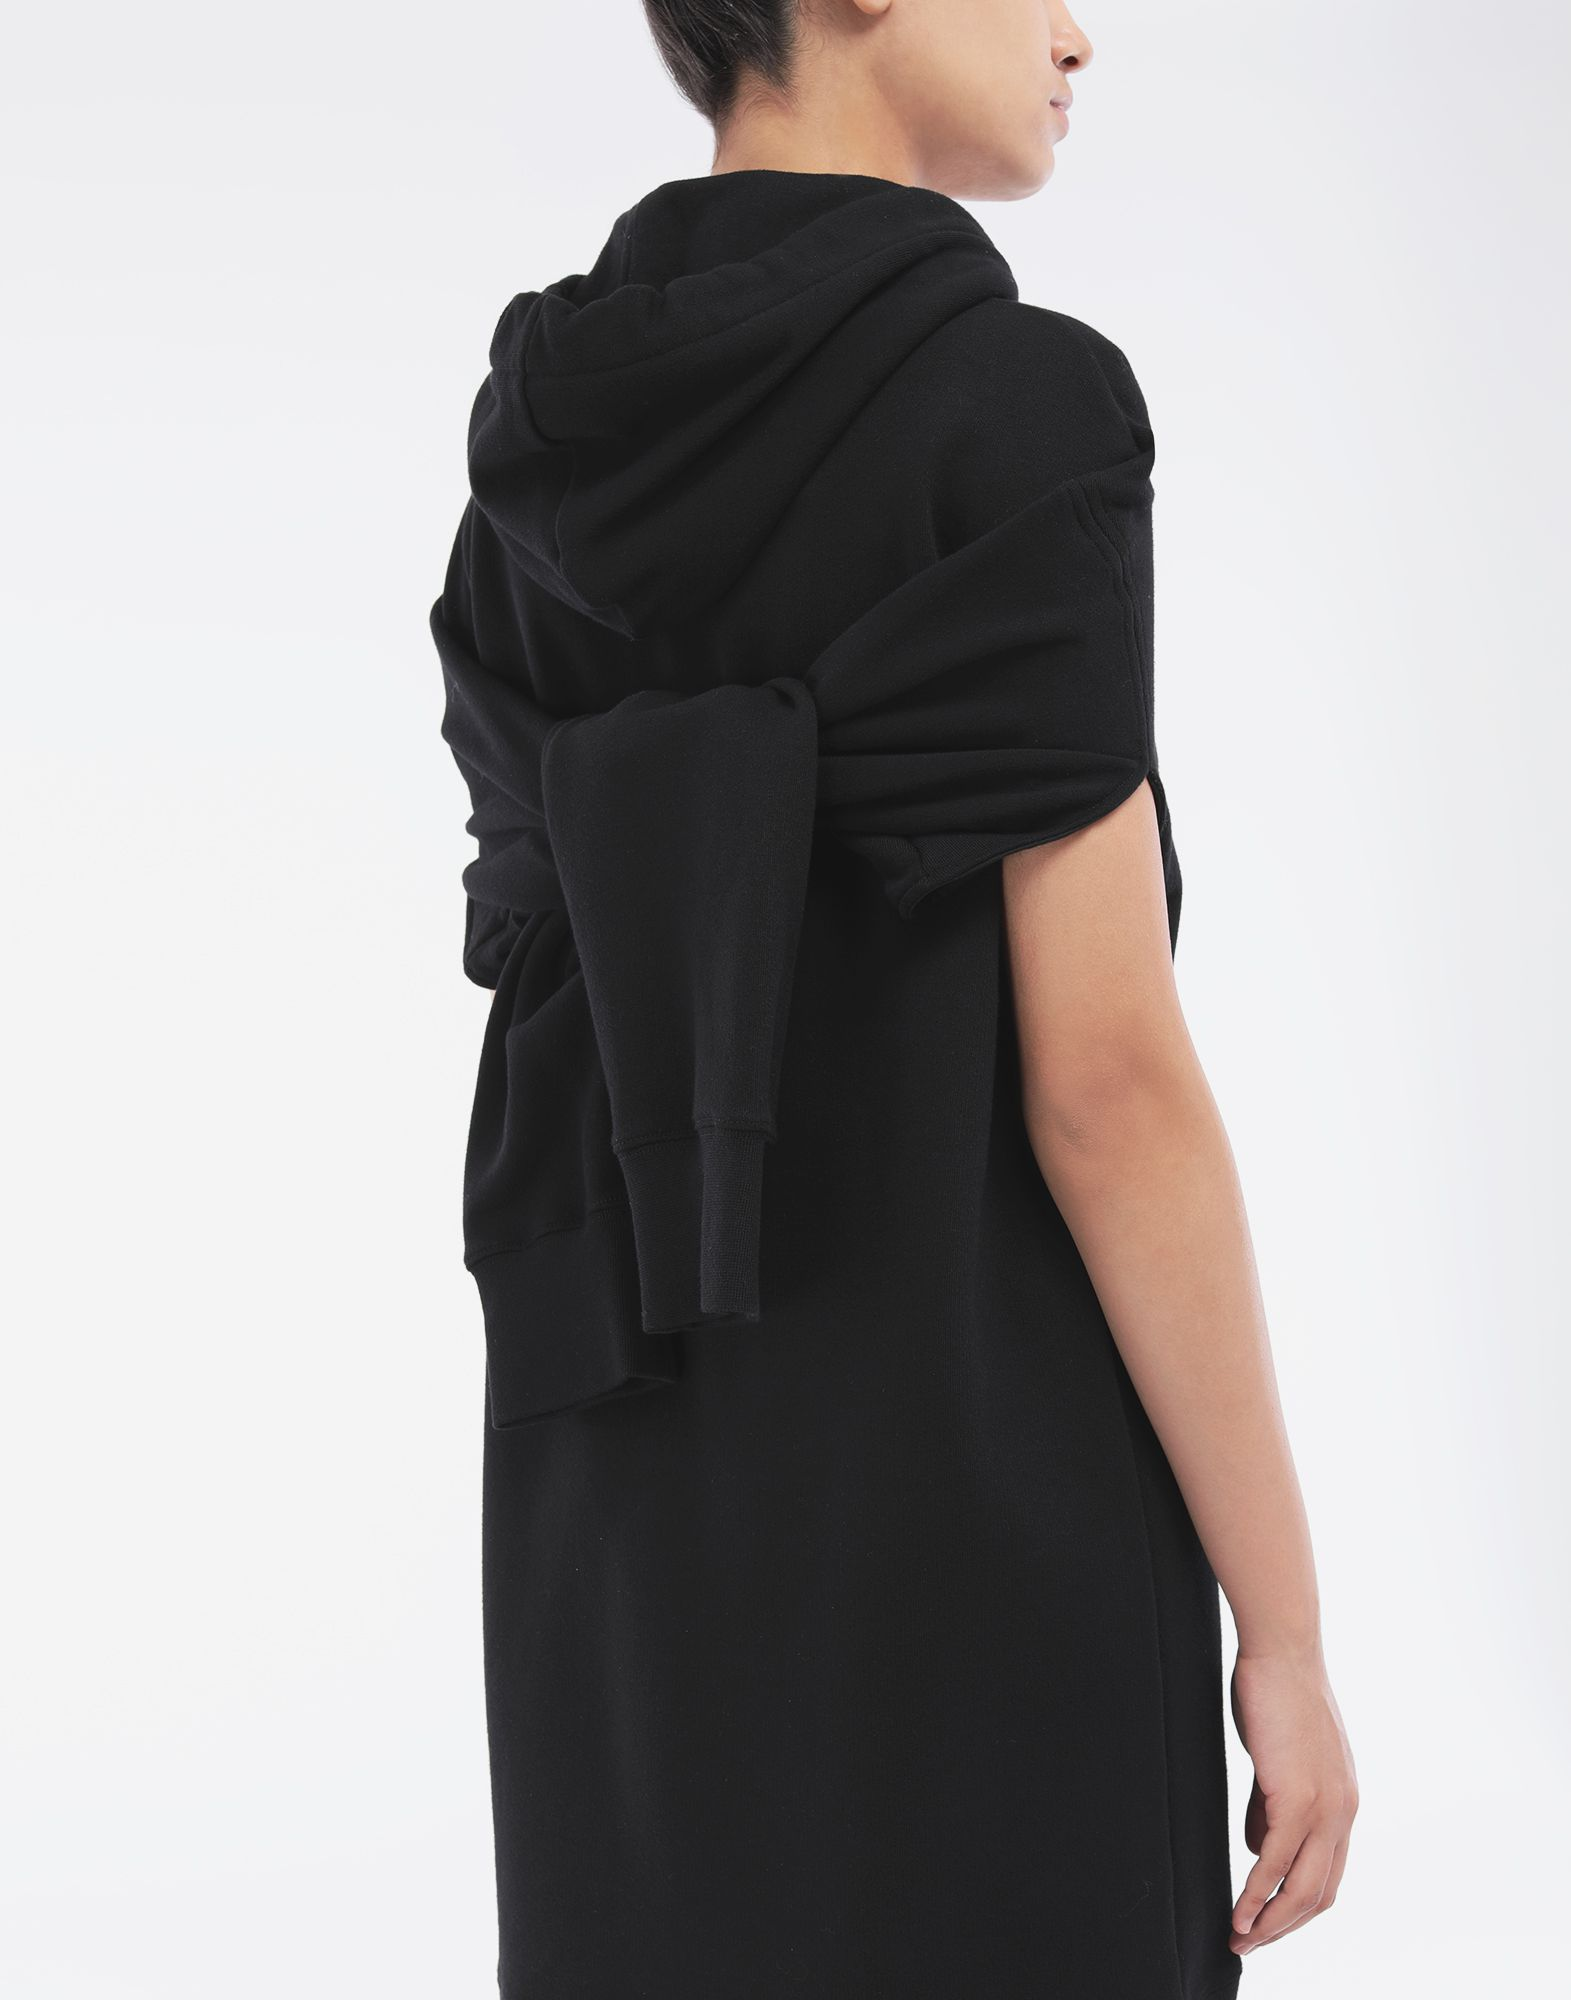 MAISON MARGIELA Long-line hooded sweatshirt Hooded sweatshirt Woman b